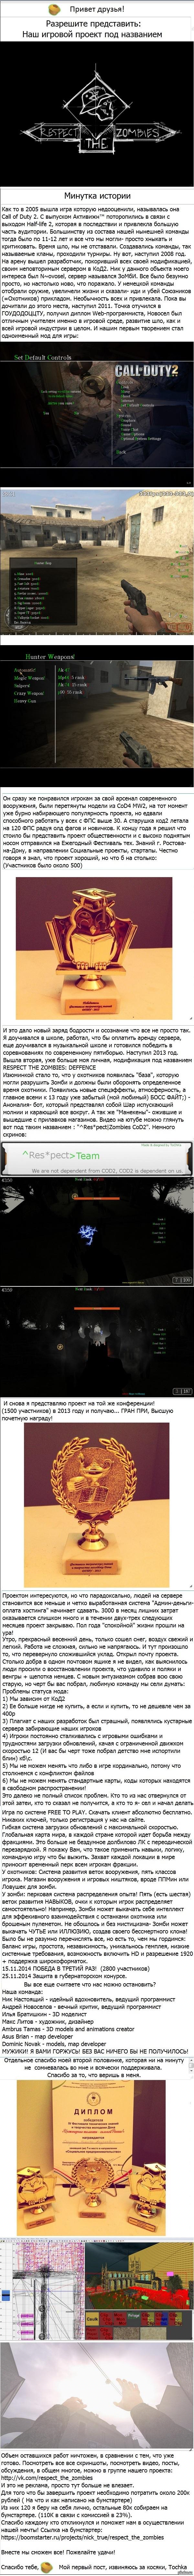 Новый-старый игровой проект! Ссылка на бумстартер   https://boomstarter.ru/projects/nick_true/respect_the_zombies